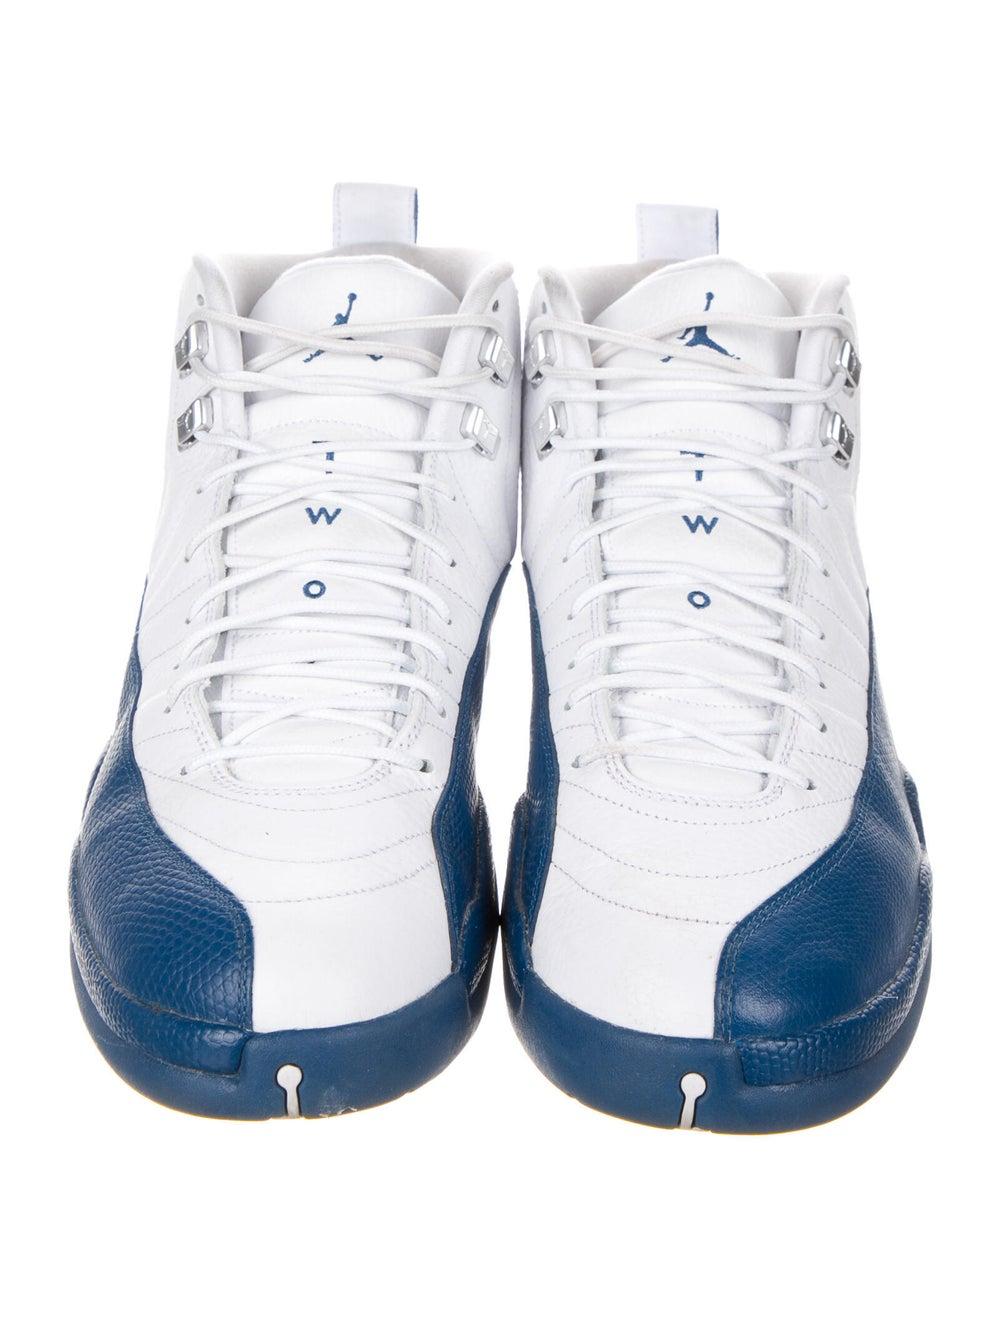 Jordan Jordan 12 Retro French Blue Sneakers Blue - image 3